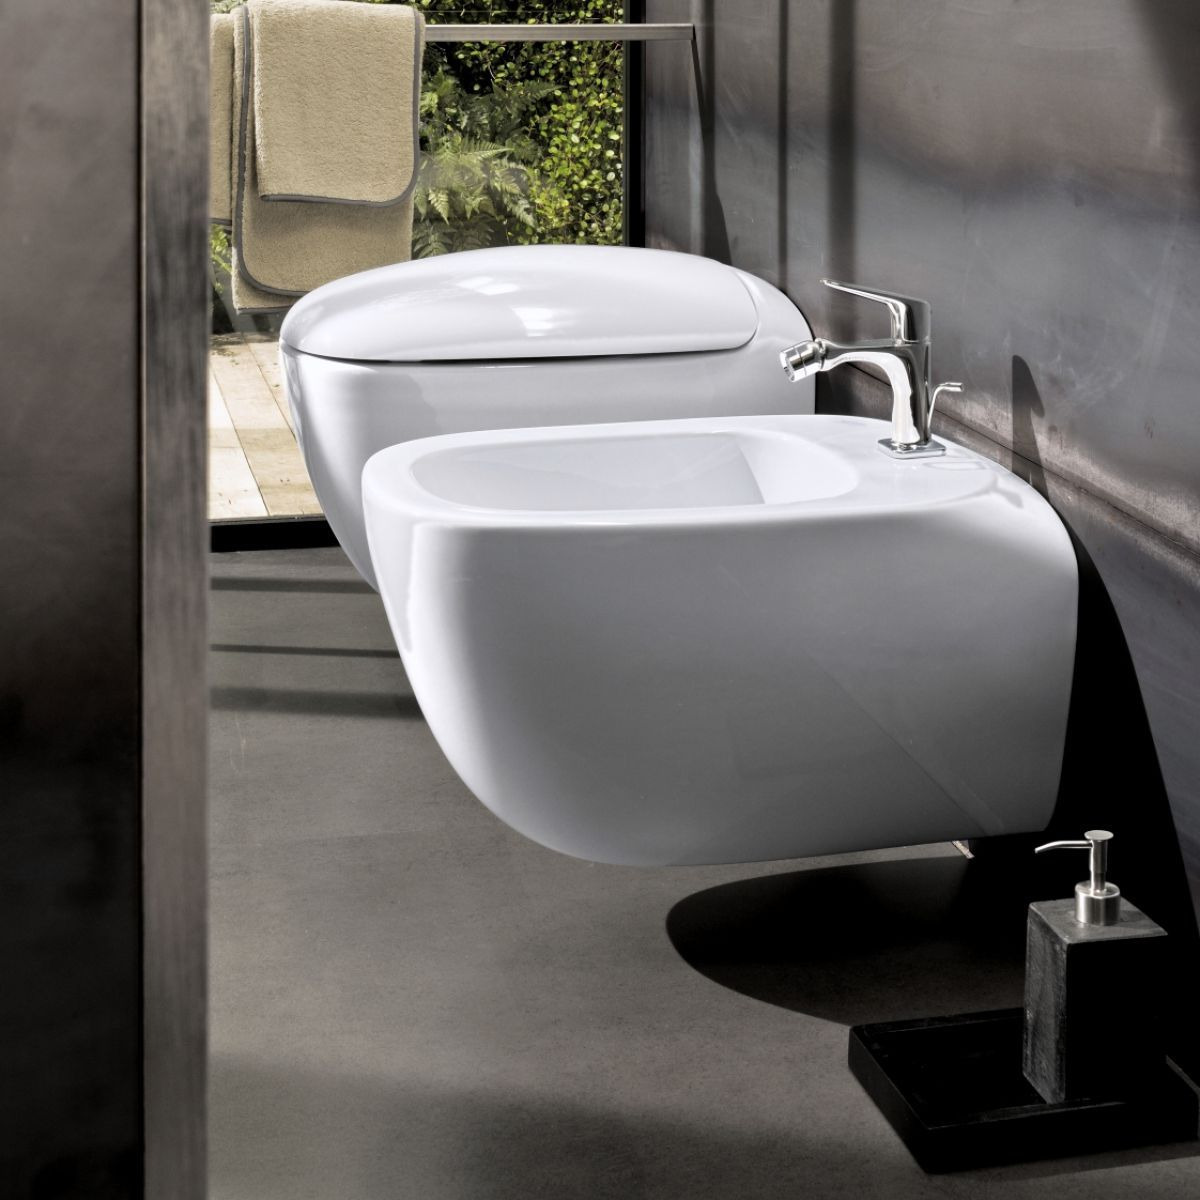 Amazing Geberit Citterio Wall Hung Bidet Bathrooms Bathroom Dailytribune Chair Design For Home Dailytribuneorg